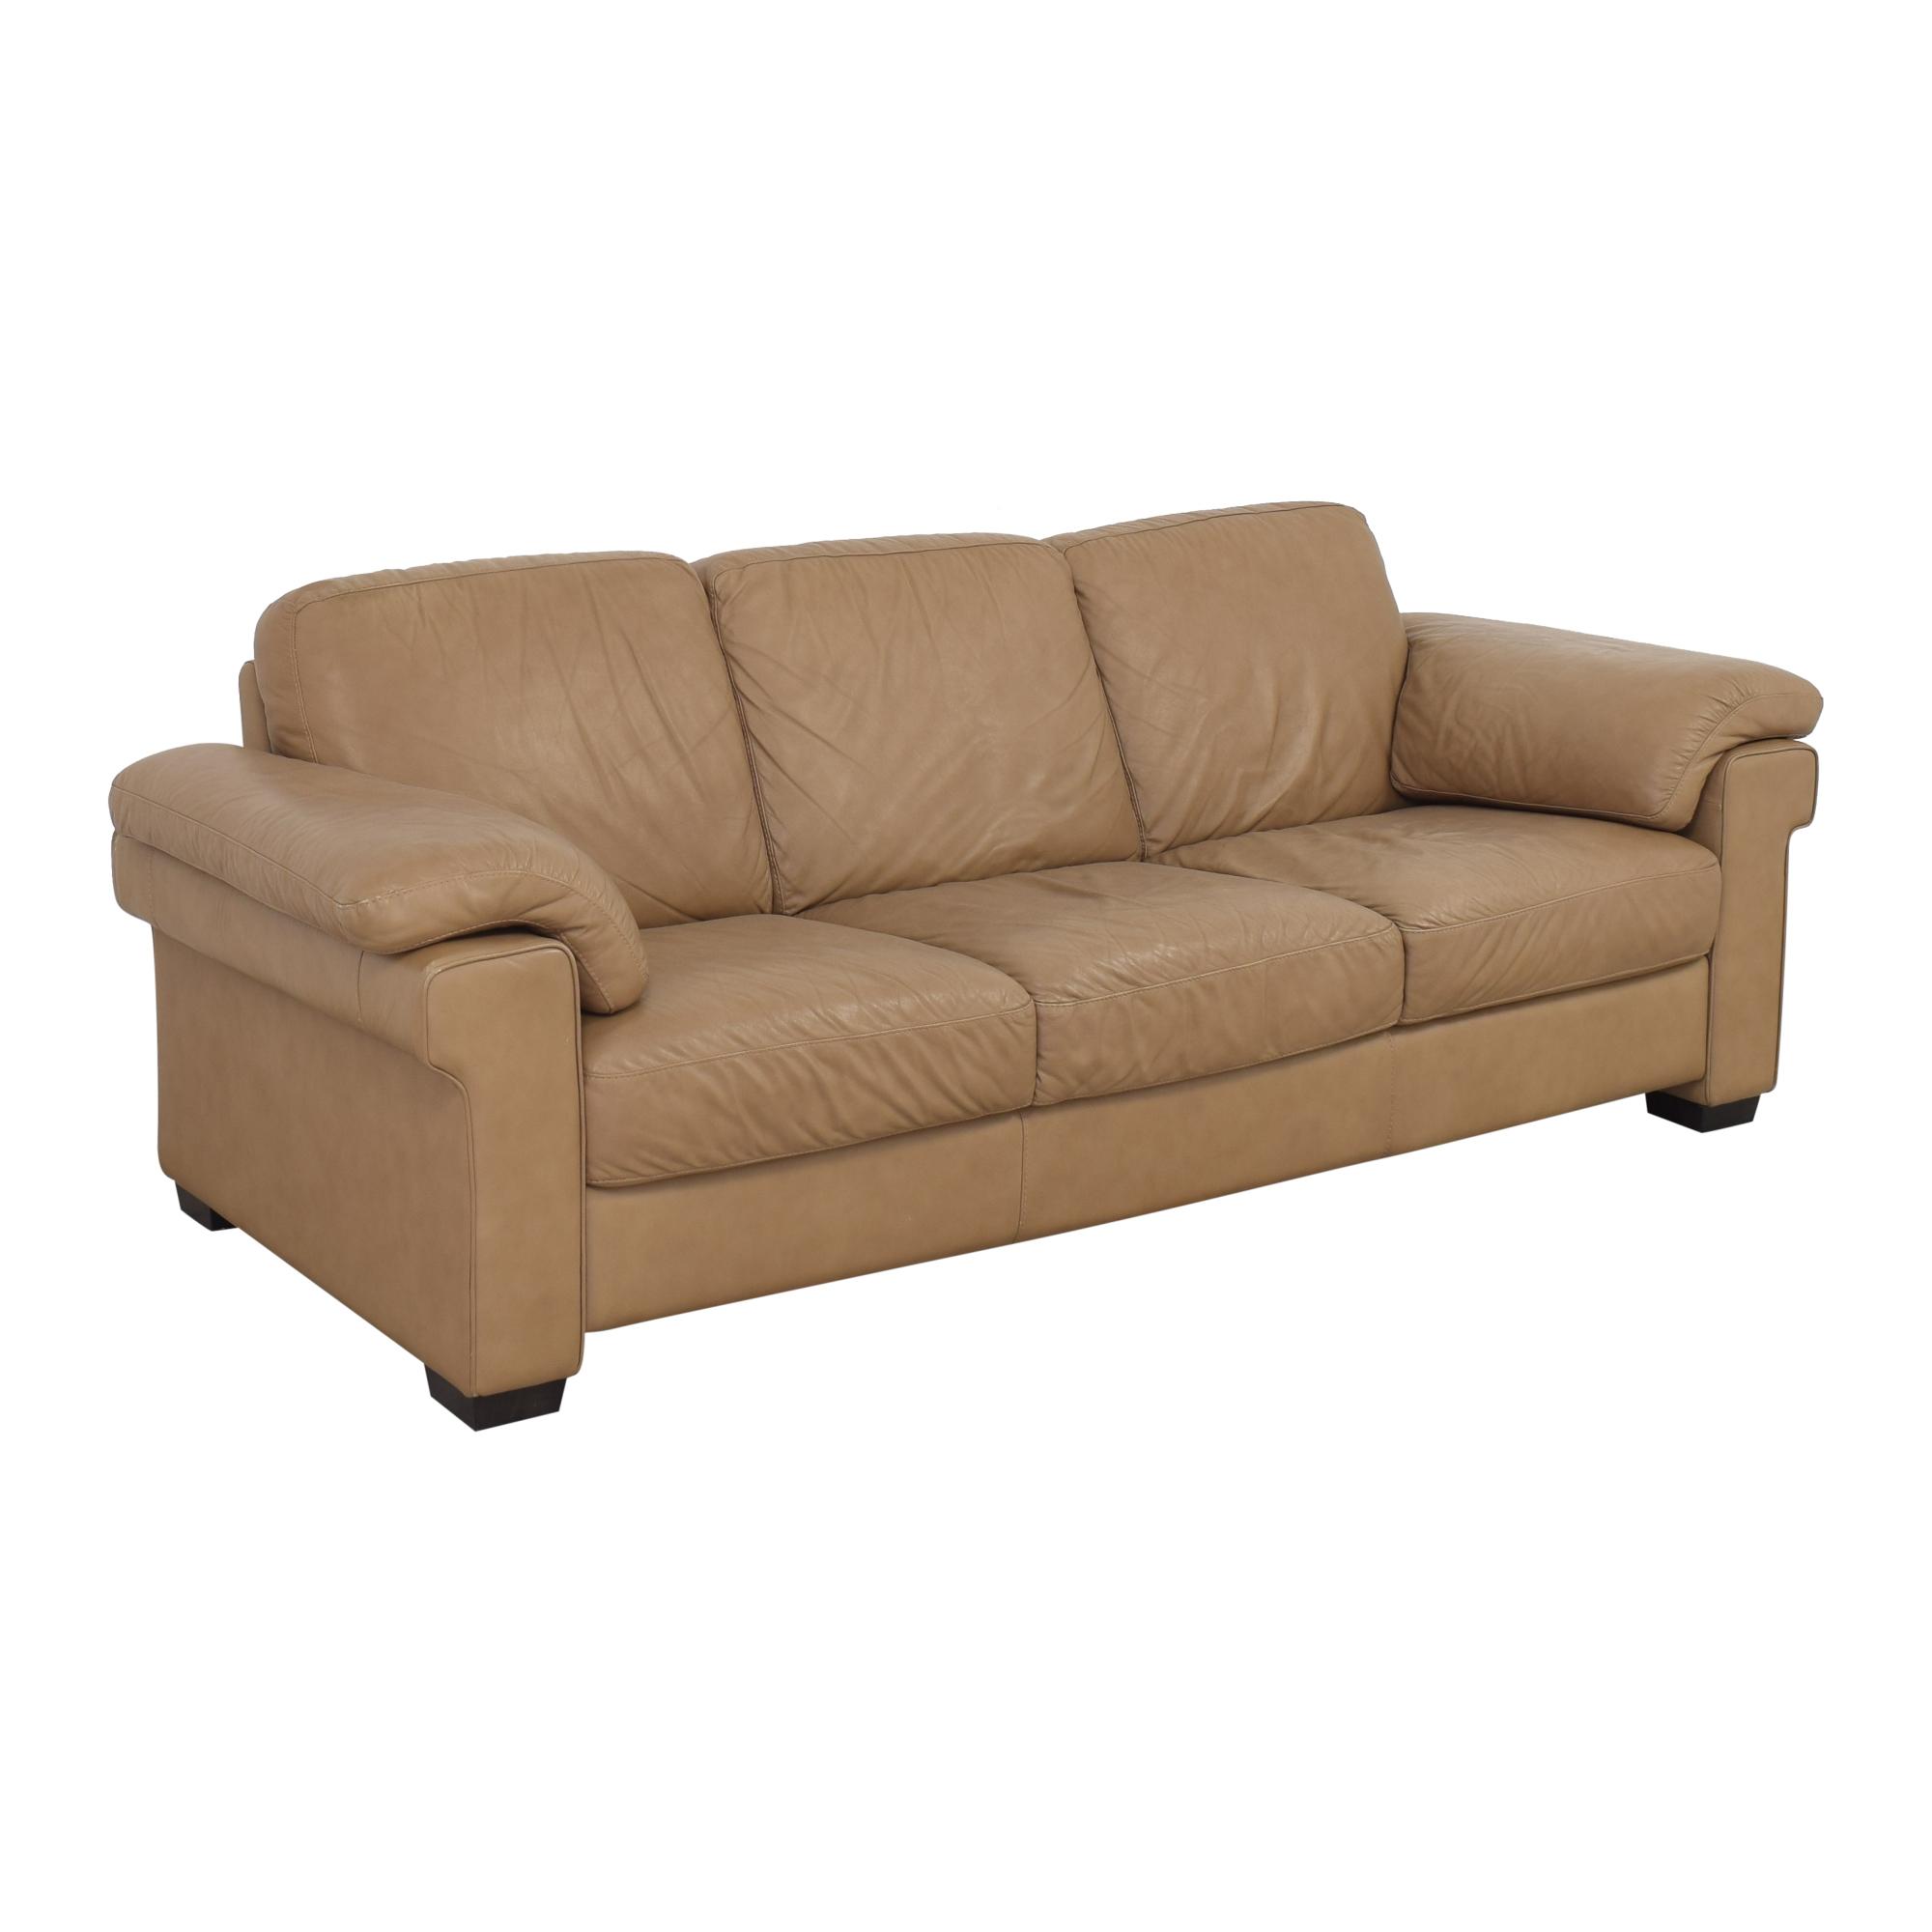 Natuzzi Natuzzi Three Seat Sofa Sofas